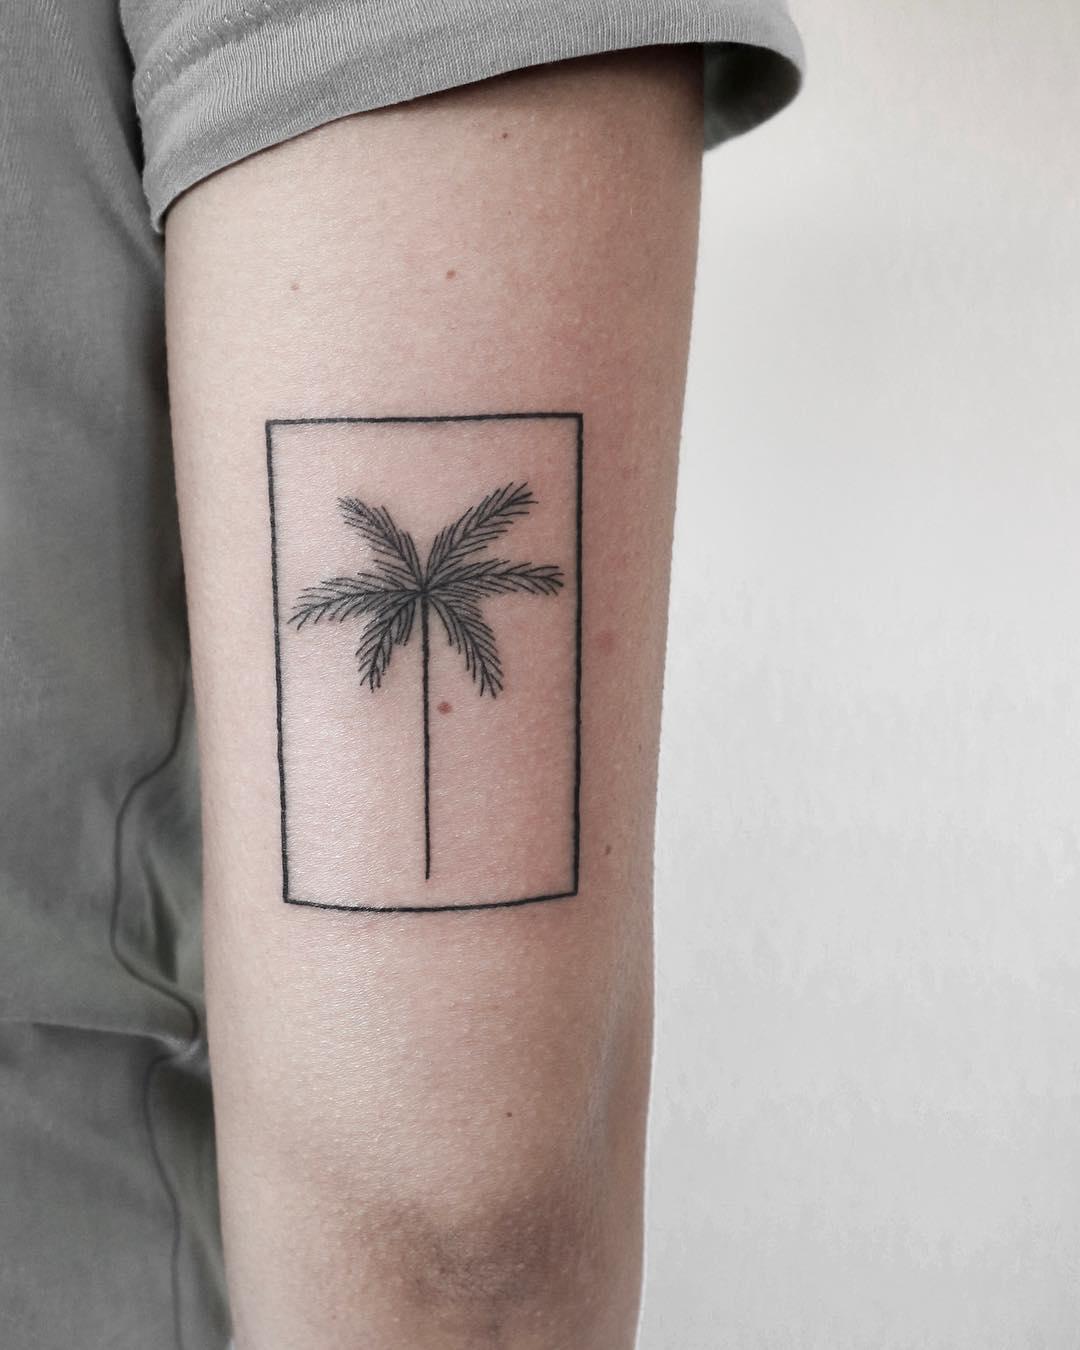 A palm in a frame tattoo by Ann Gilberg